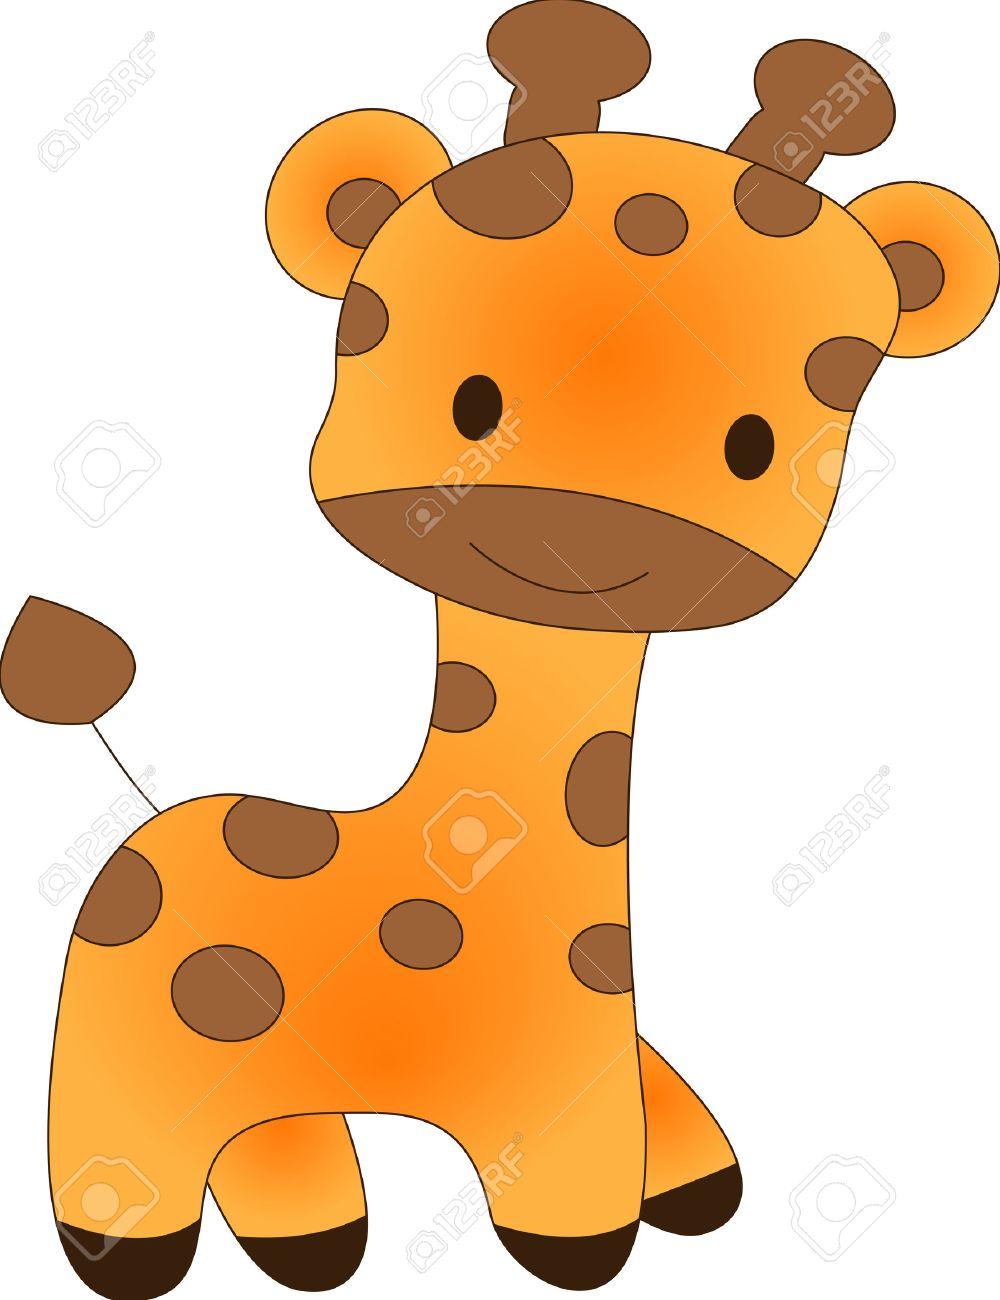 Funny giraffe - vector illustration. Fully editable, easy color change. Stock Vector - 4141862